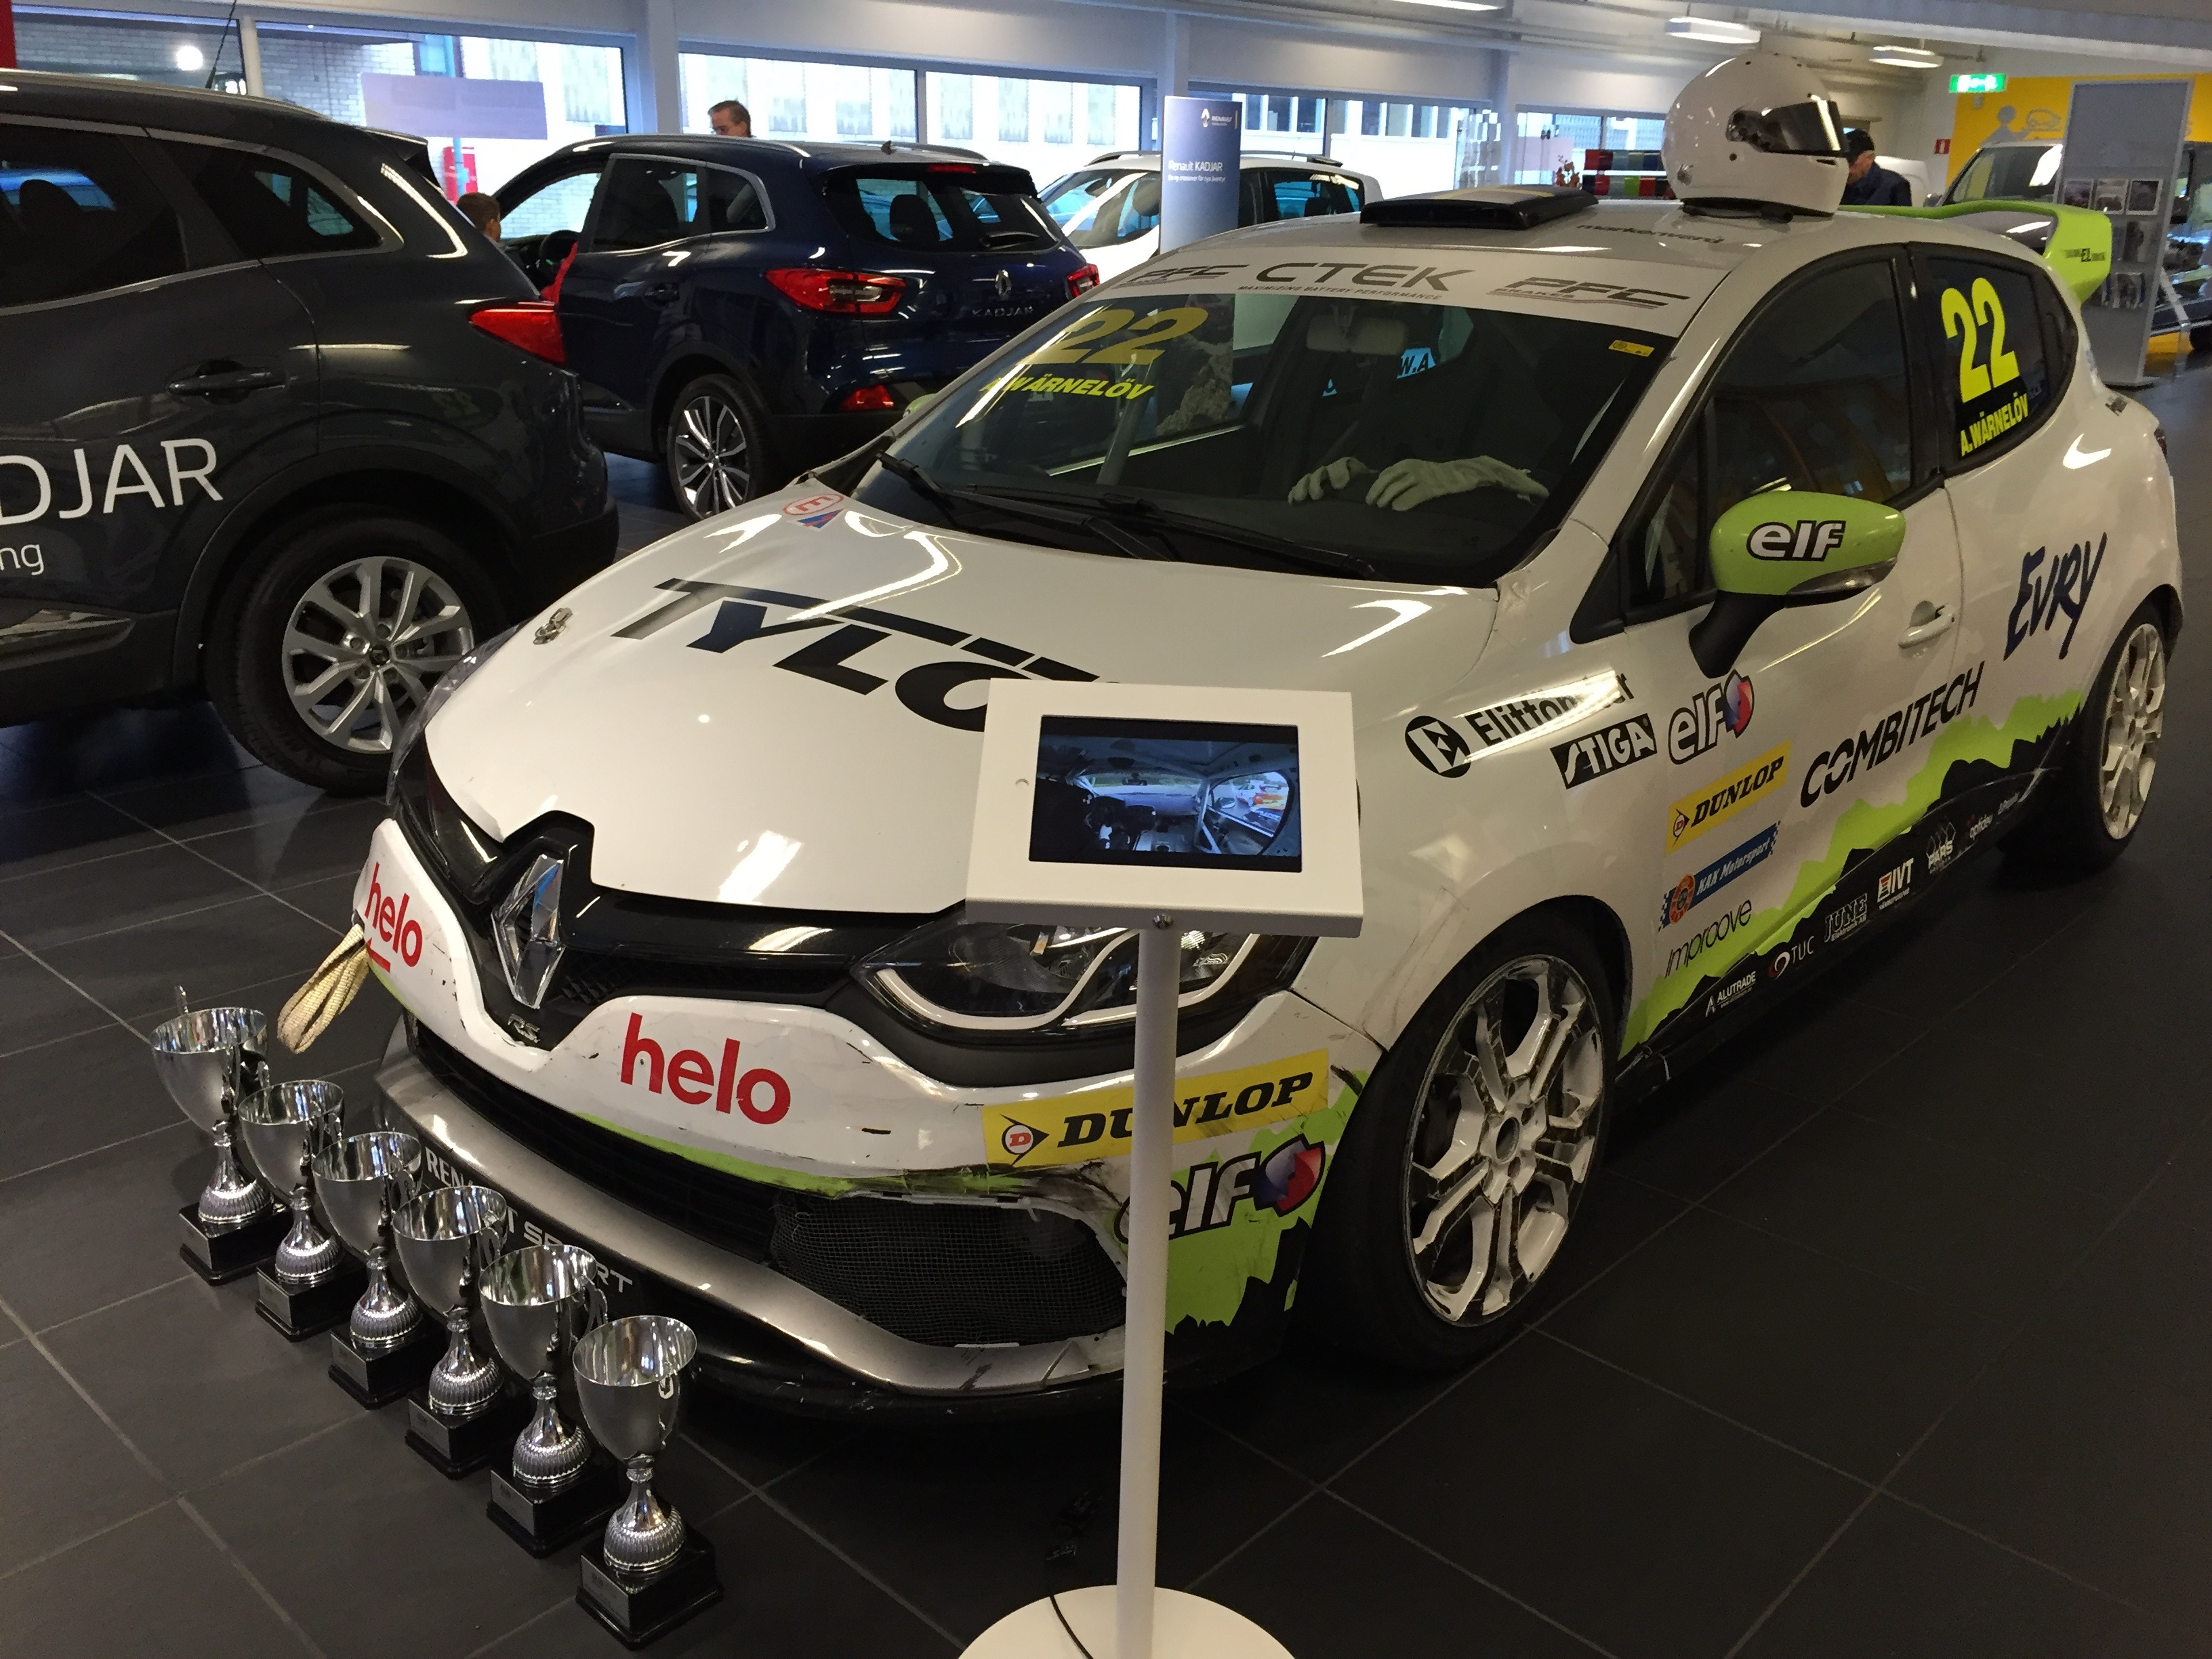 Experion racing teams Clio Cup racingbil ställs ut i Skobes bilhandlare lokaler